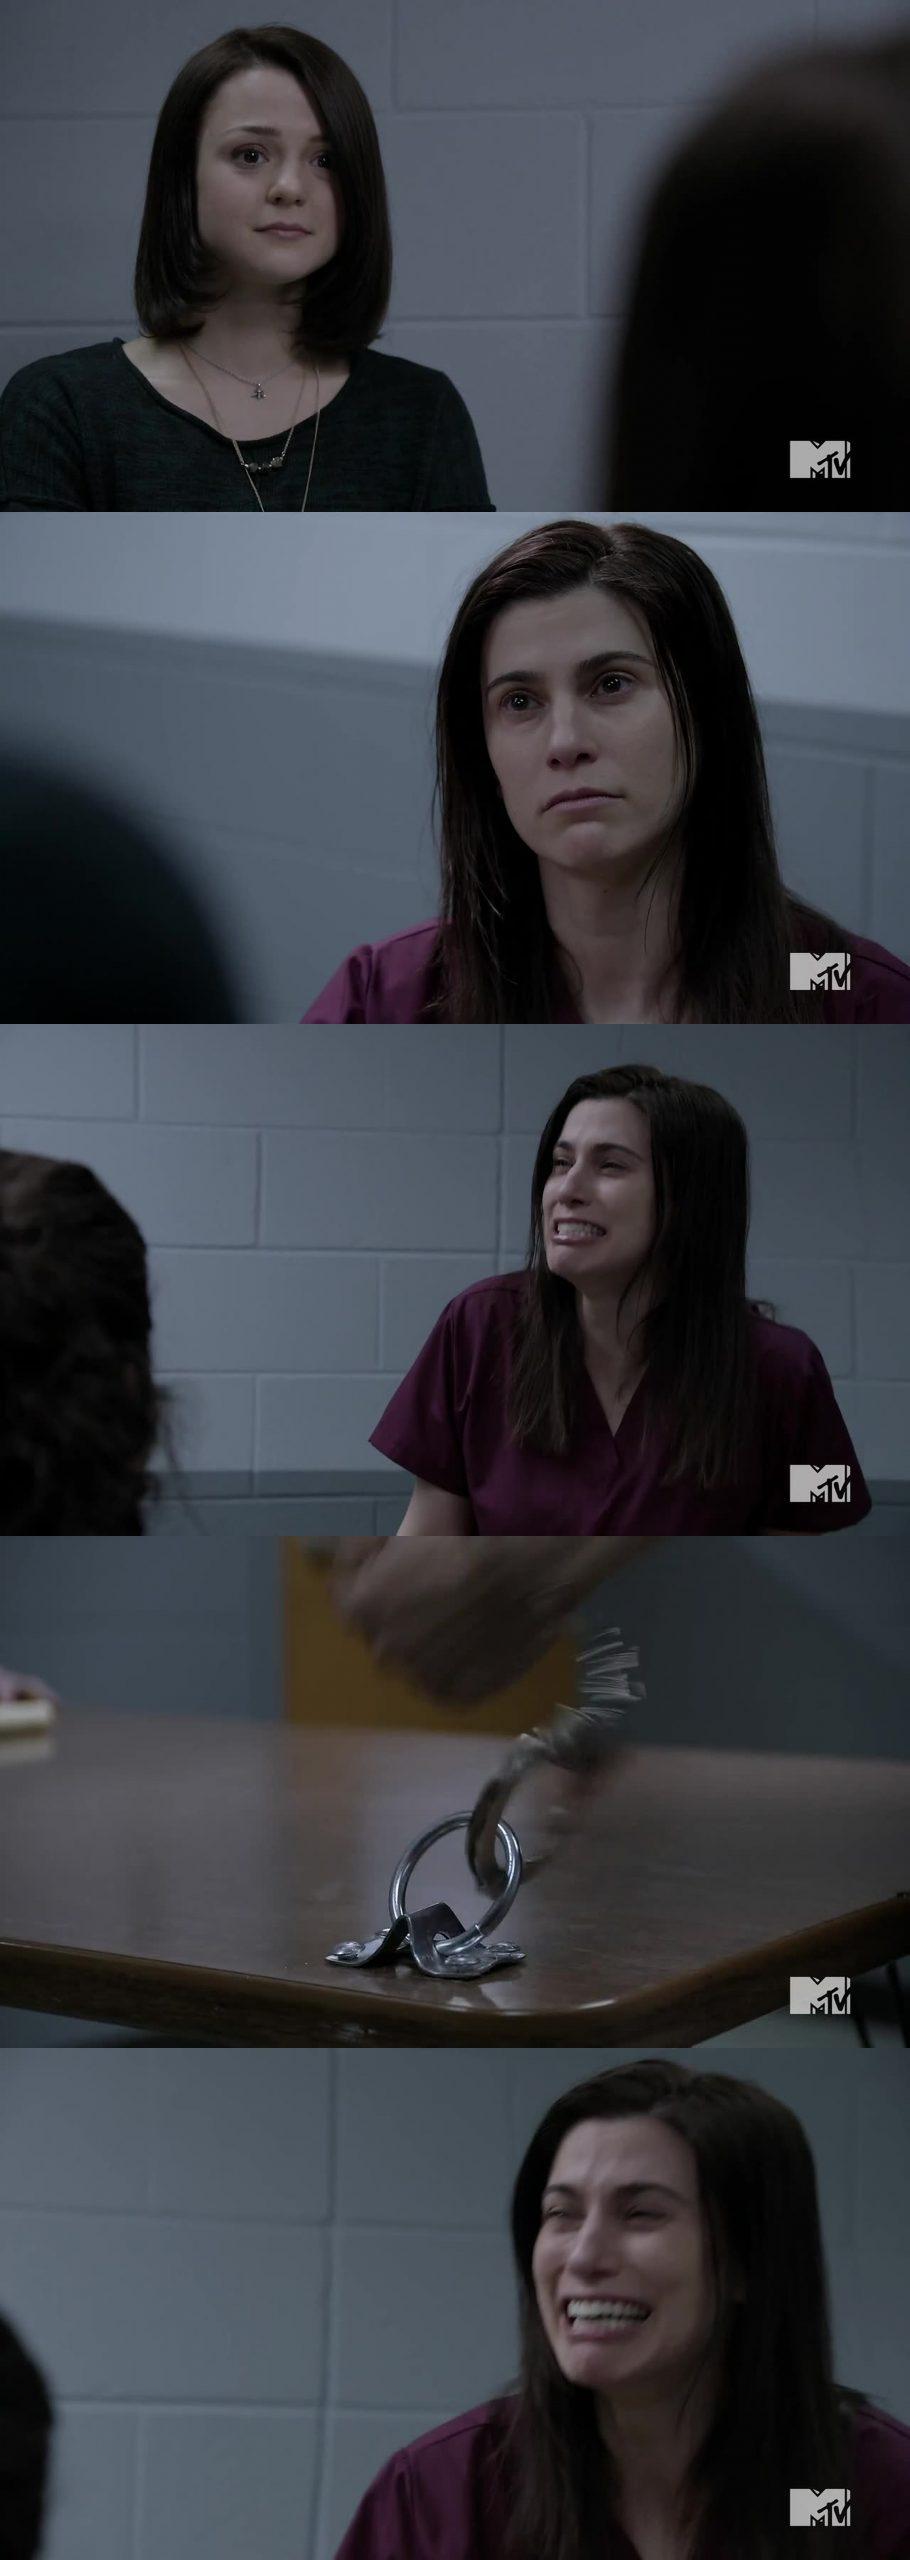 Psycho Lori o fa solo finta? | 2×04 Finding Carter